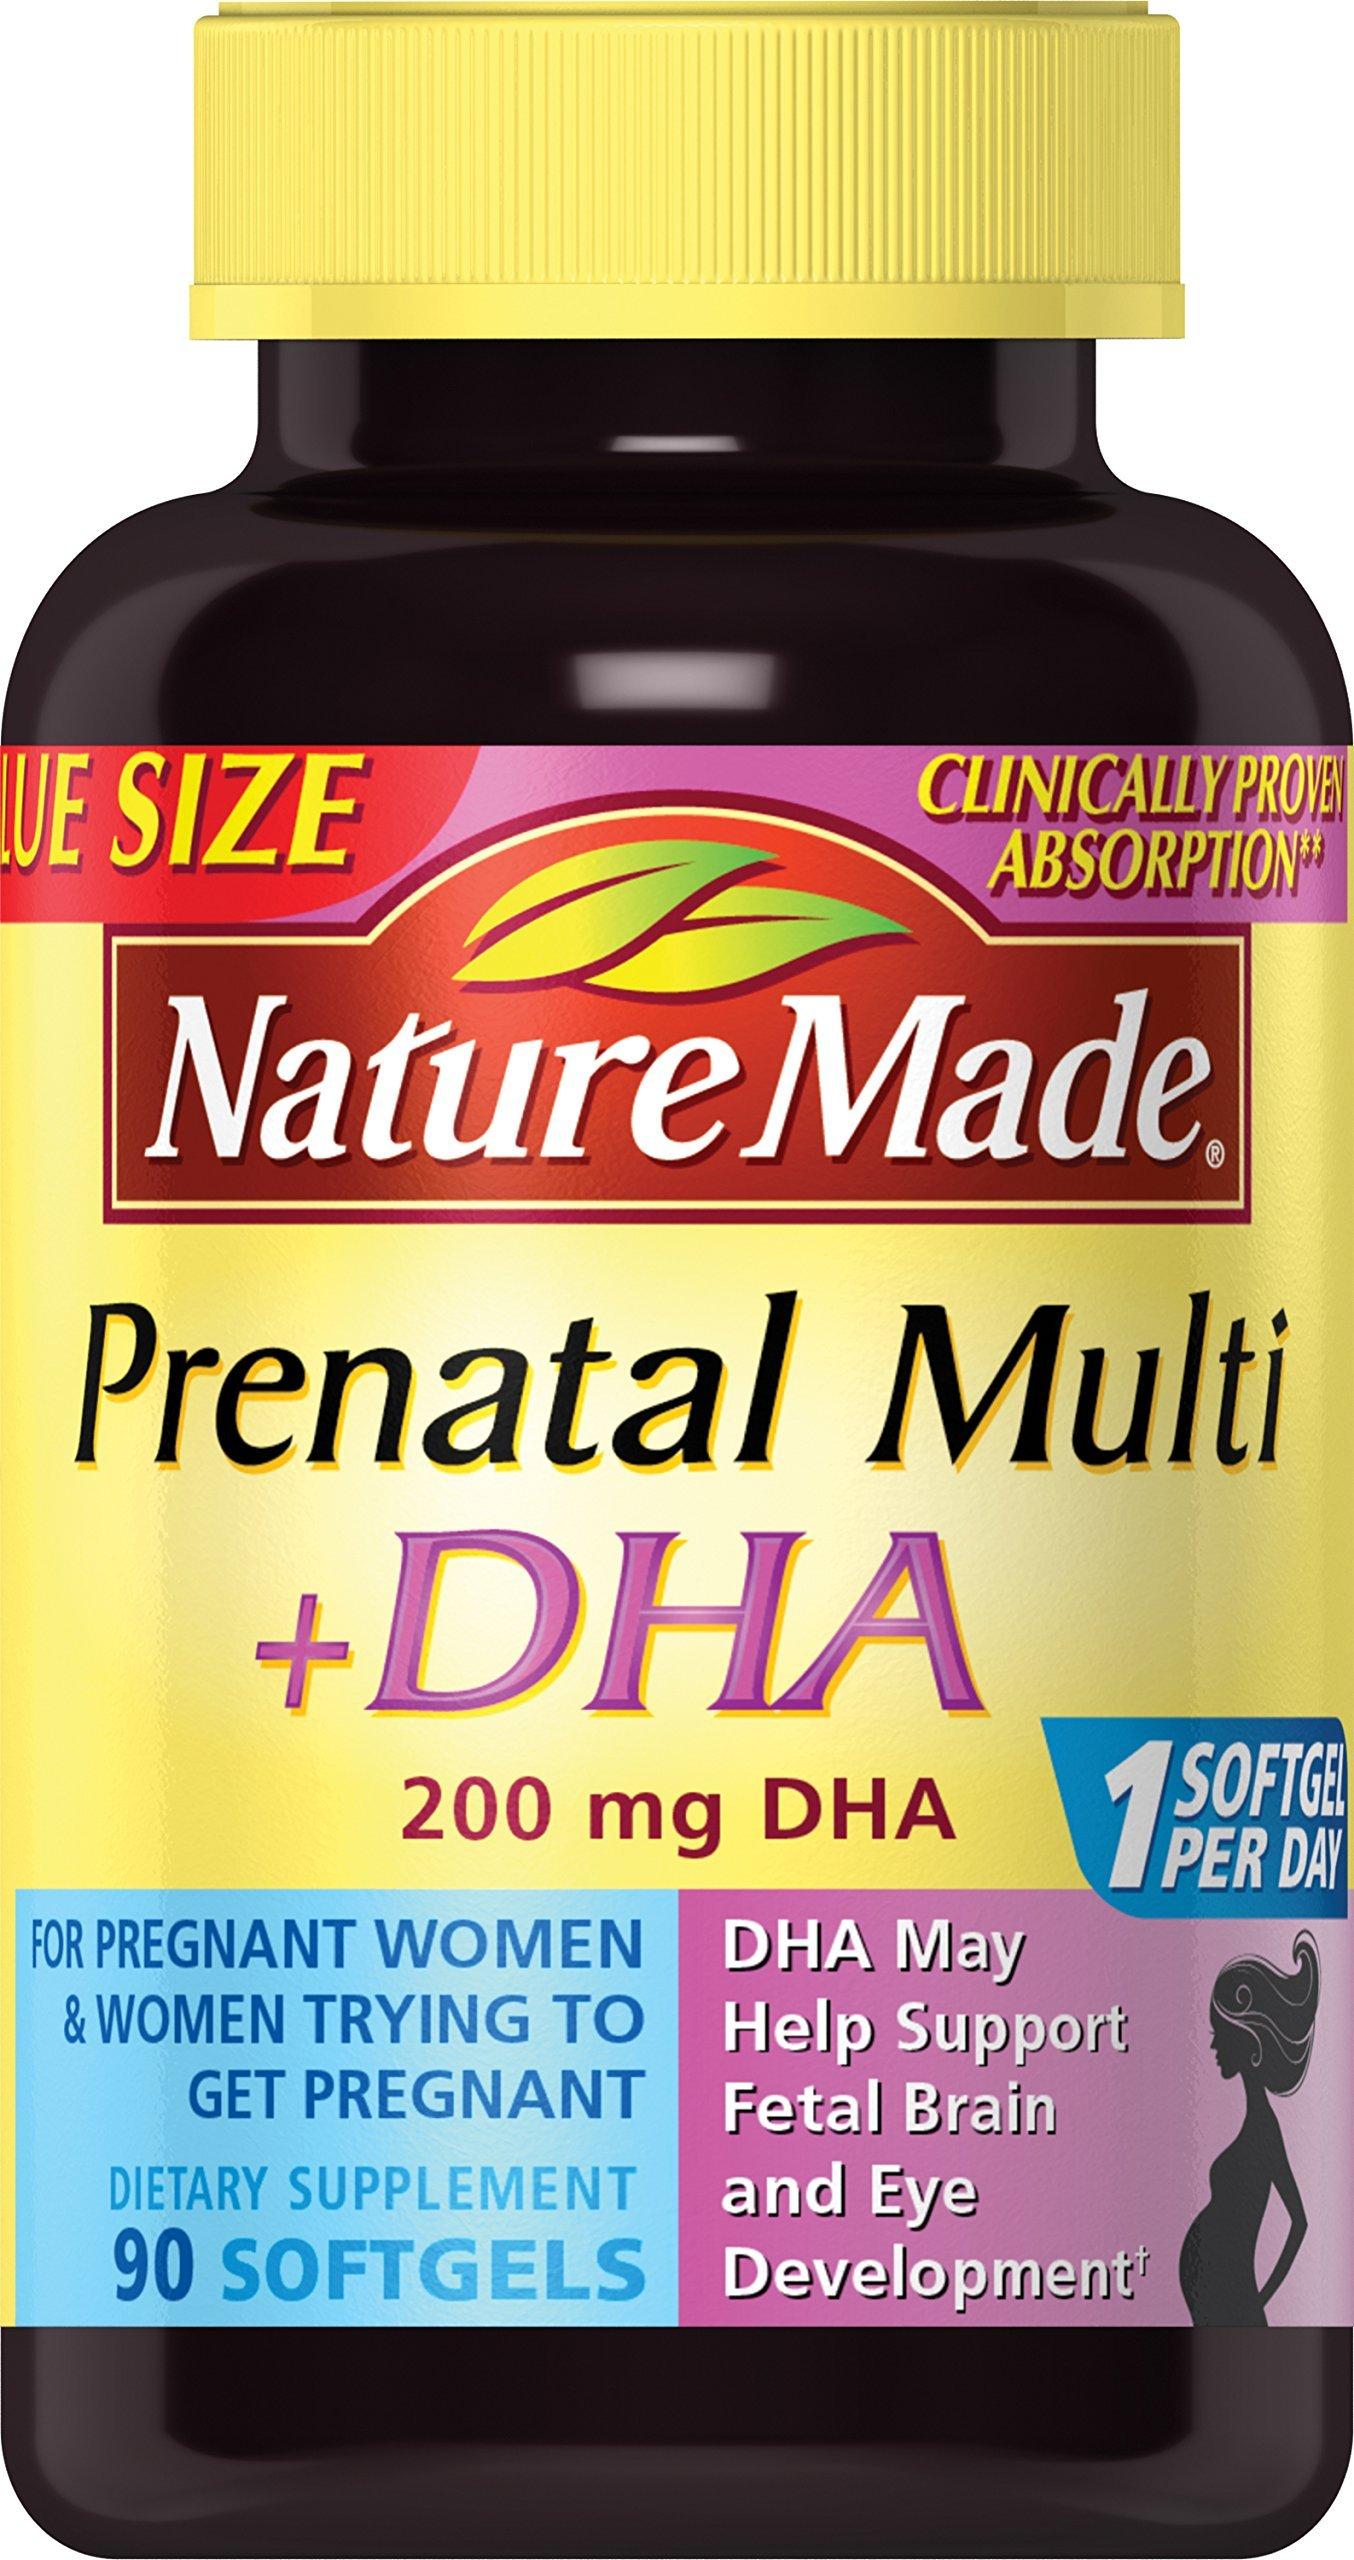 Nature Made Prenatal + DHA 200 mg Softgels Value Size 90 Ct